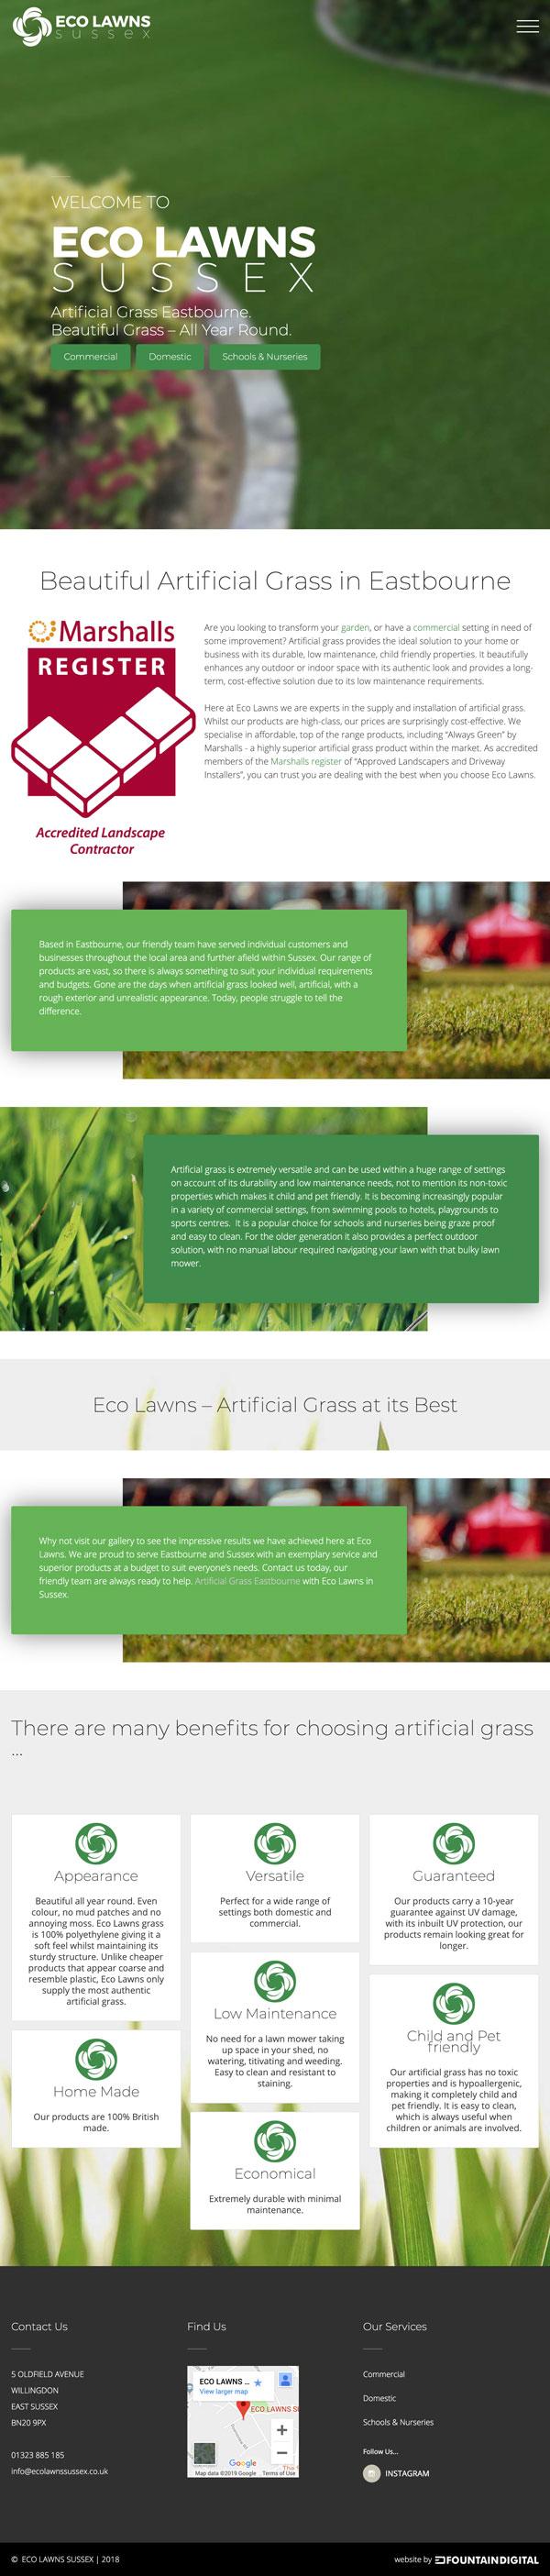 ipad image of website design